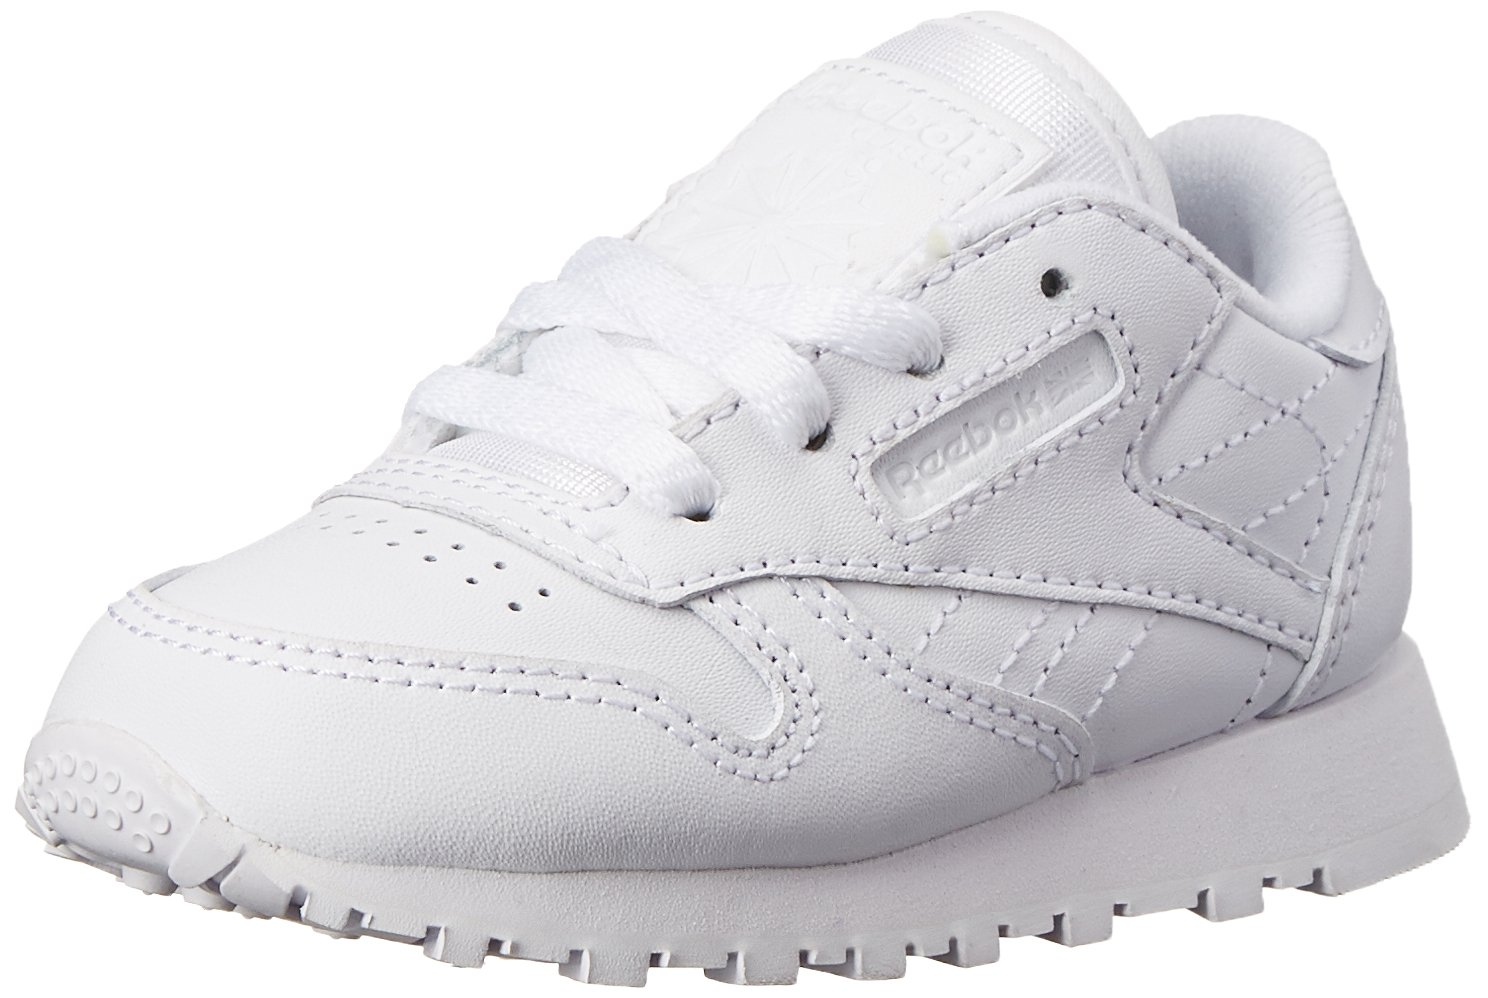 Reebok Classic Leather Shoe,White/White/White,7.5 M US Toddler